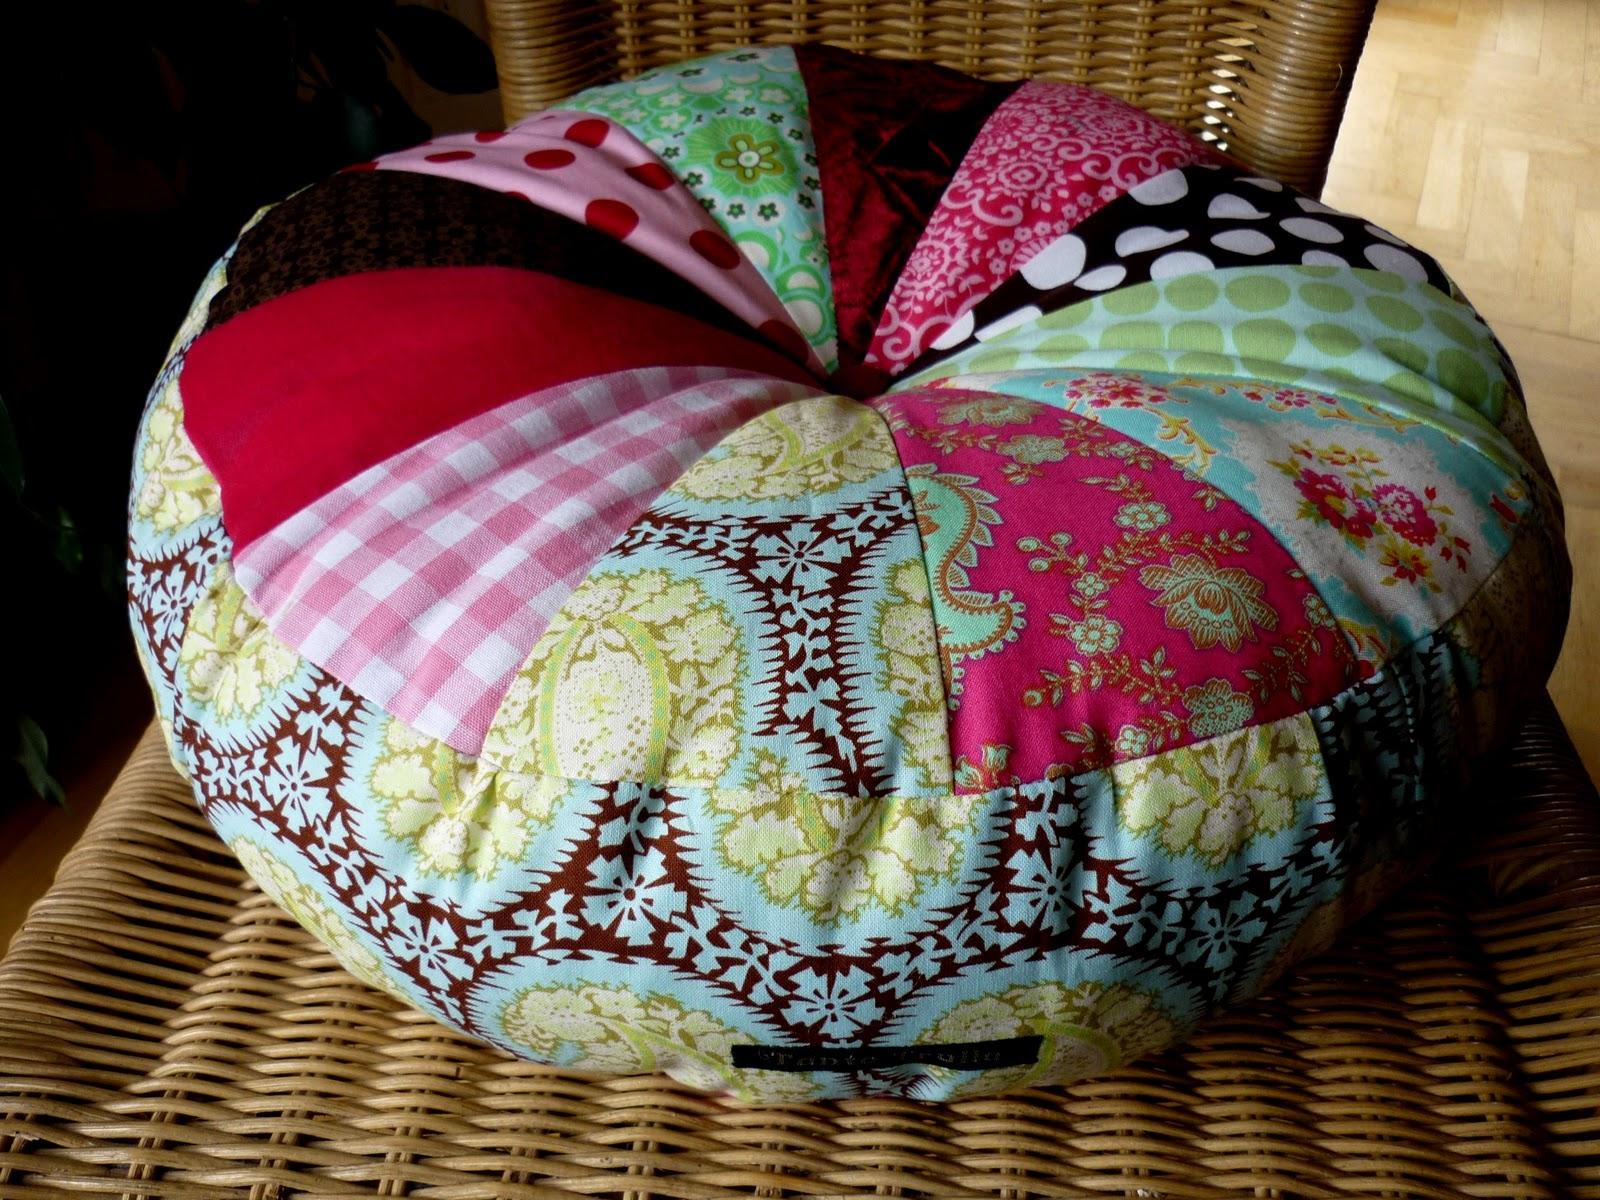 atelier tante trulla best pillow. Black Bedroom Furniture Sets. Home Design Ideas